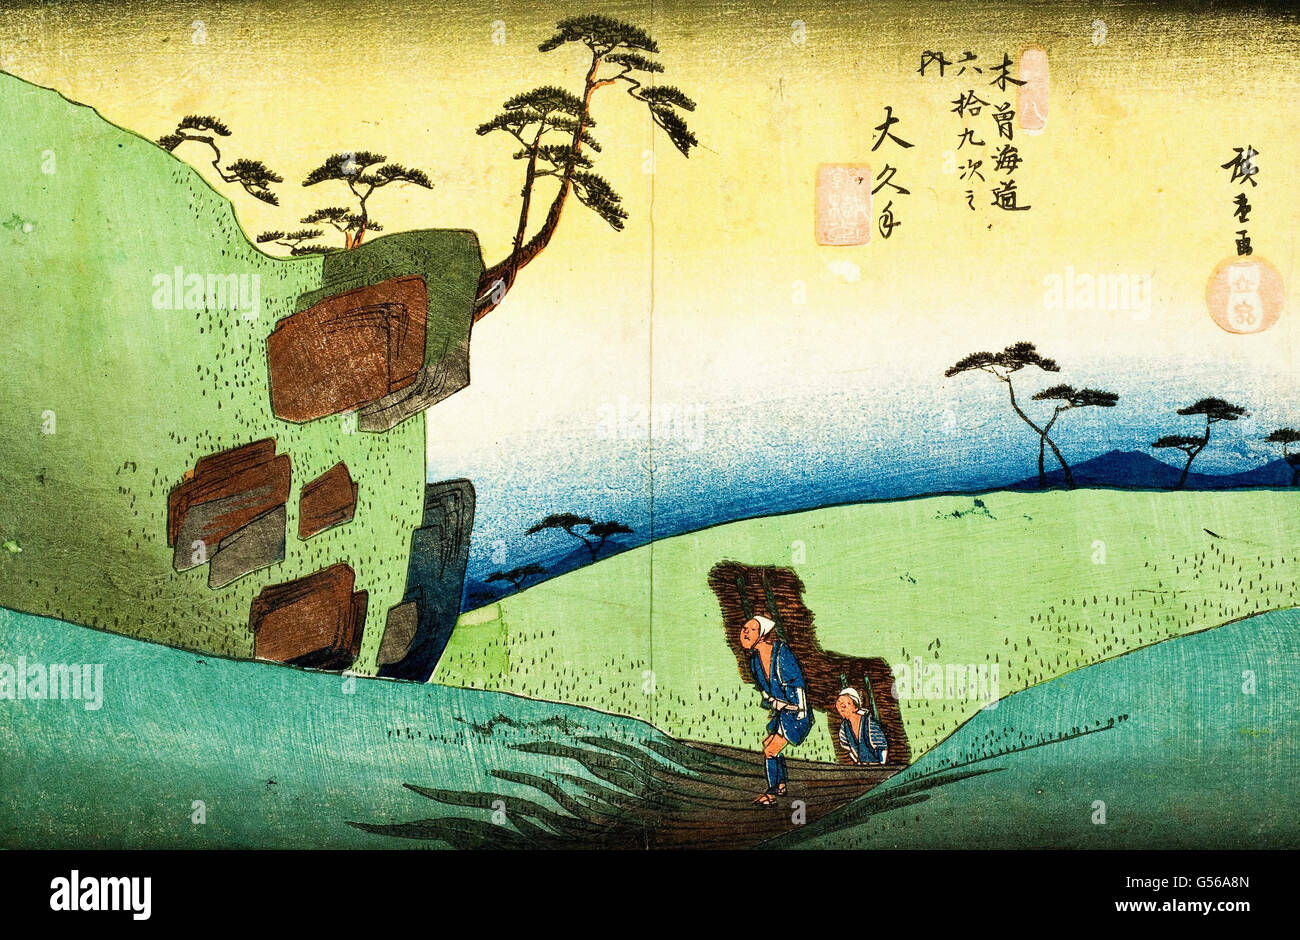 Utagawa Hiroshige - xilografia Immagini Stock